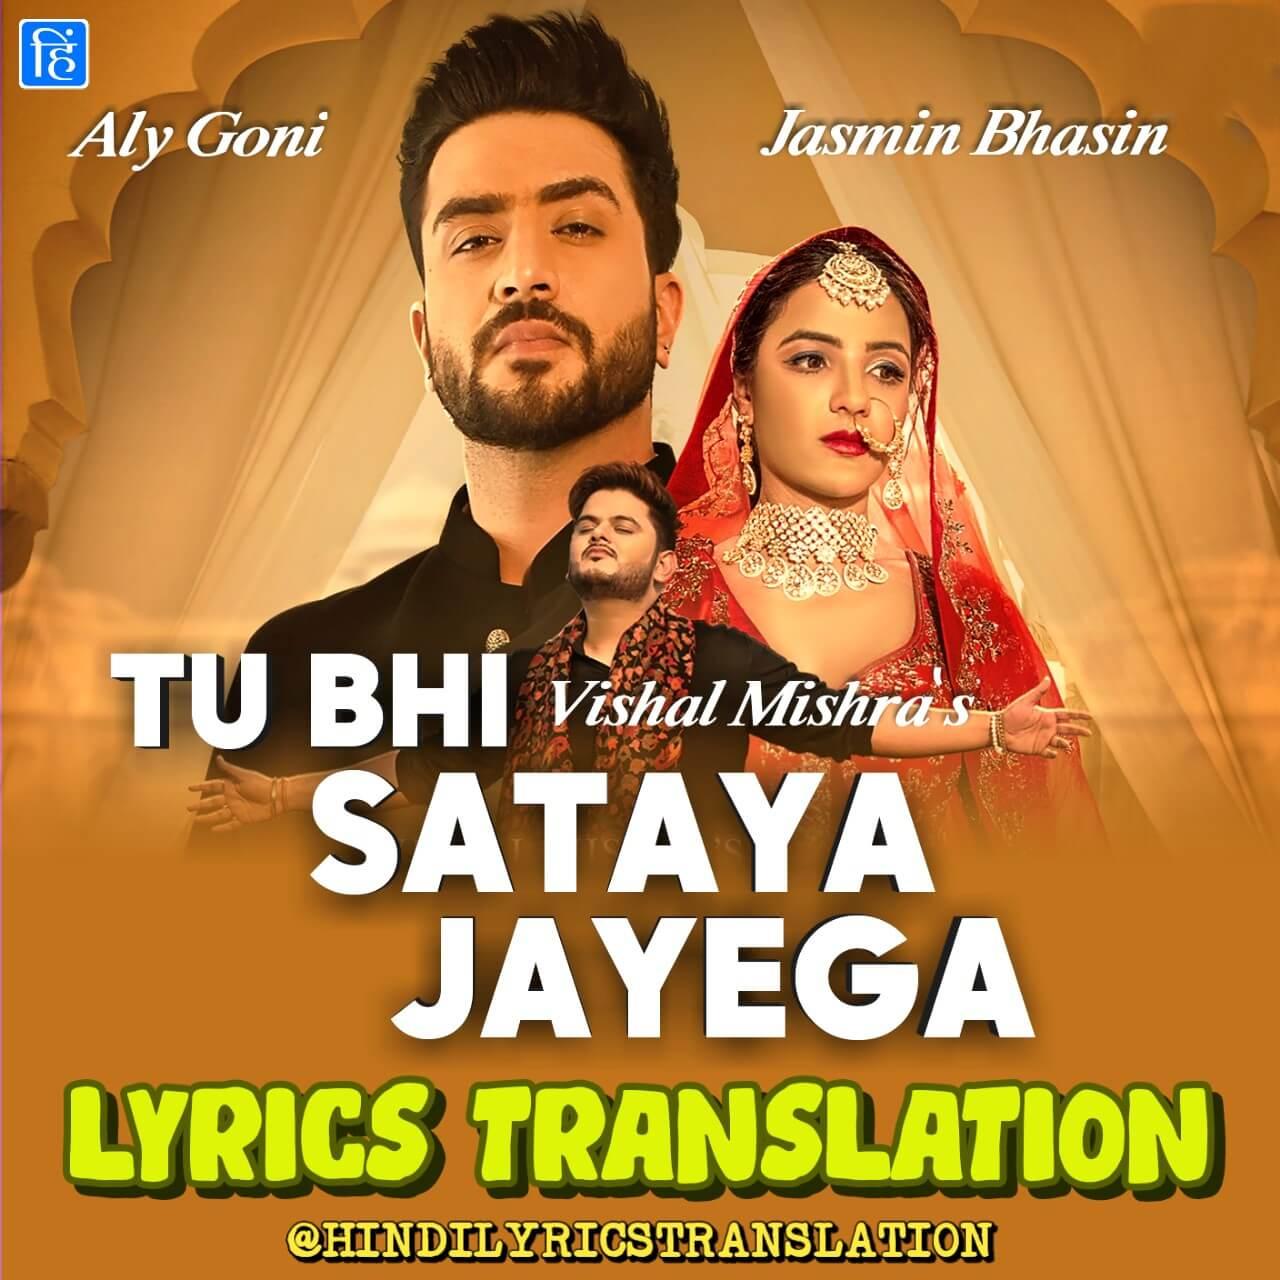 Tu Bhi Sataya Jayega Lyrics Translation In English - Vishal Mishra